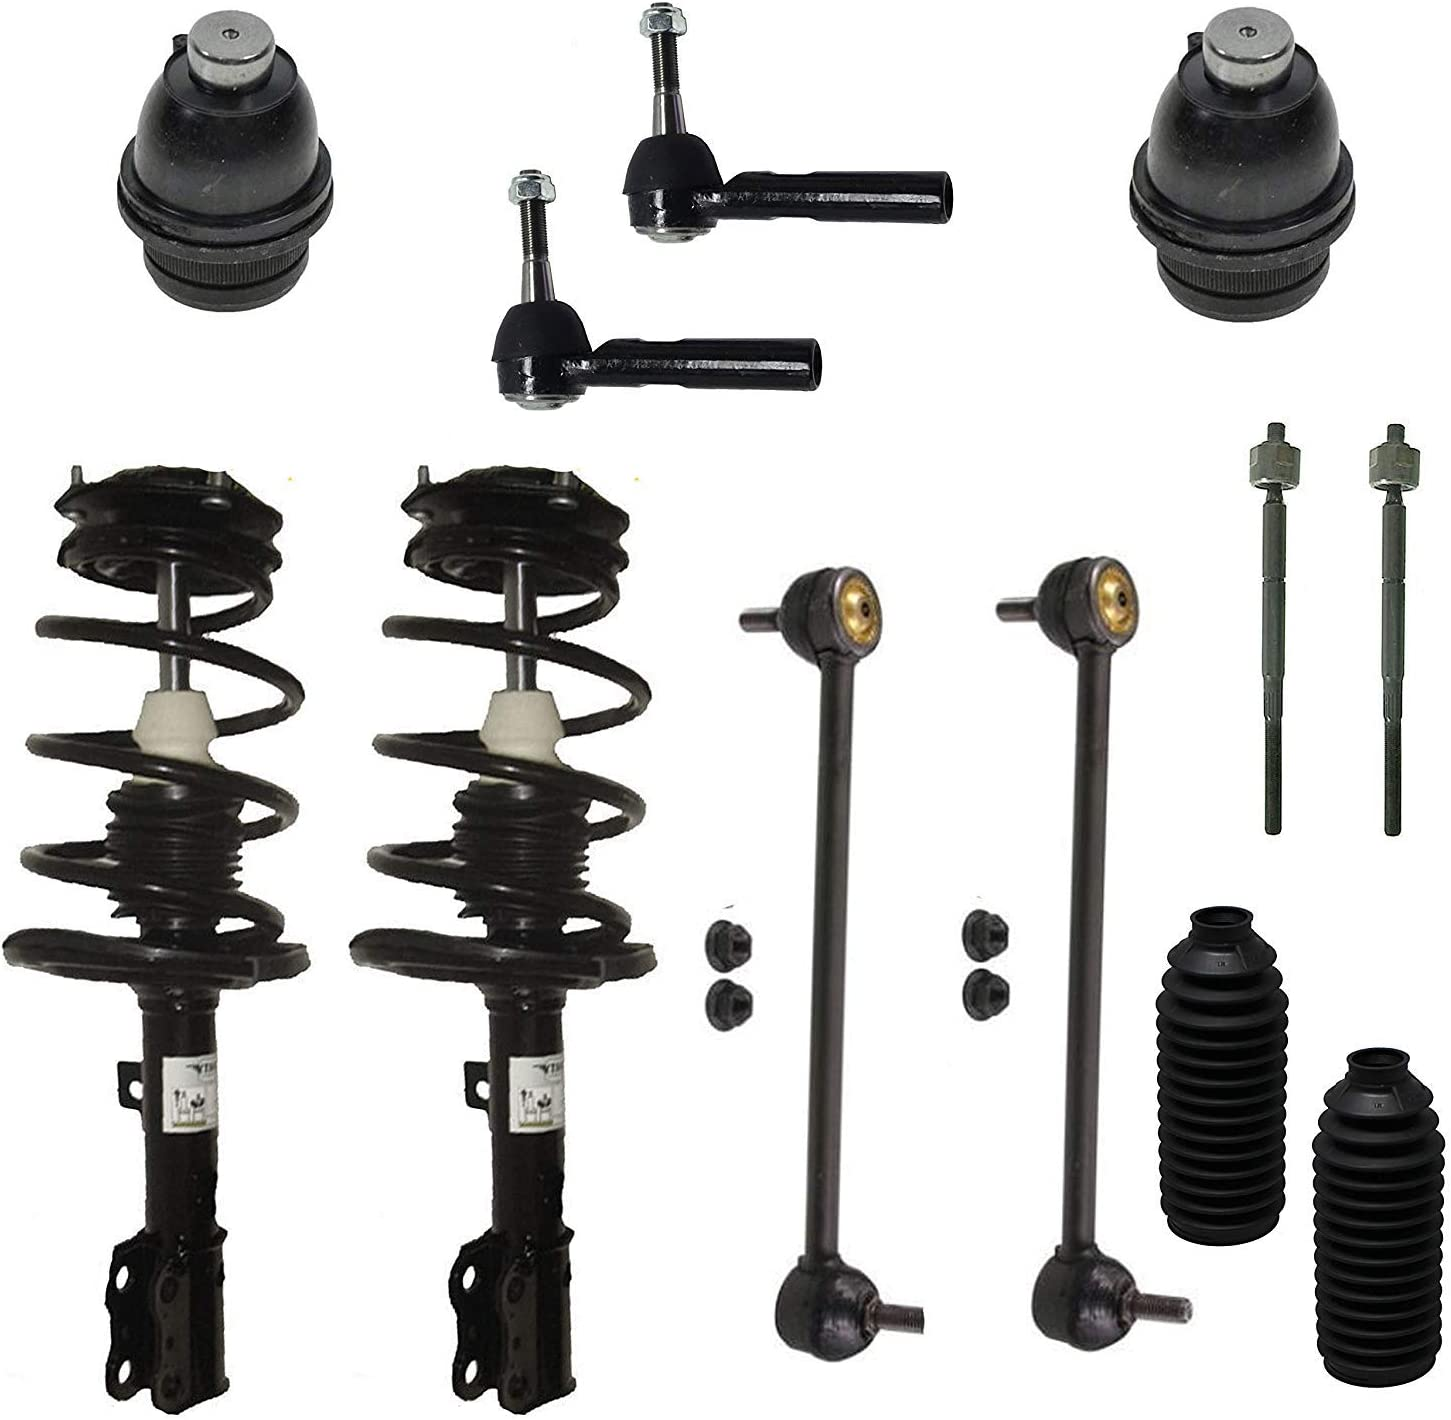 OCPTY Suspension Kits Rear shock absorber Stabilizer Bar Link Fits 2007-2010 Hyundai Elantra Set of 4